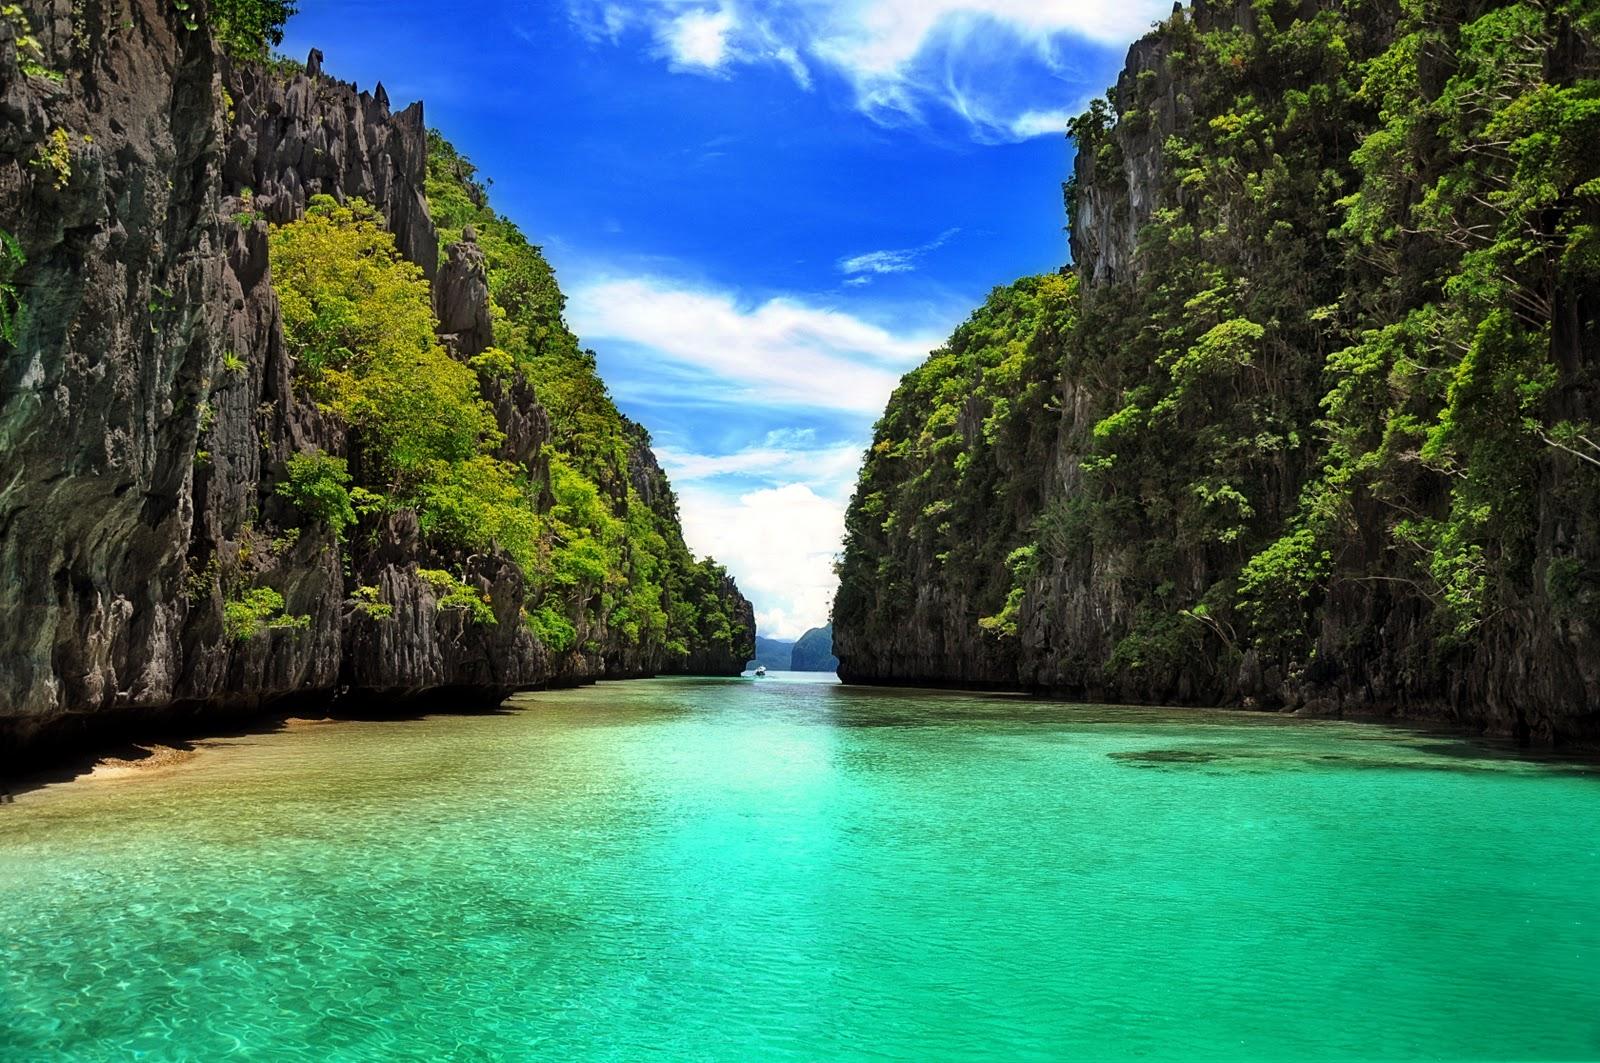 Эль-Нидо, Палаван на Филиппинах